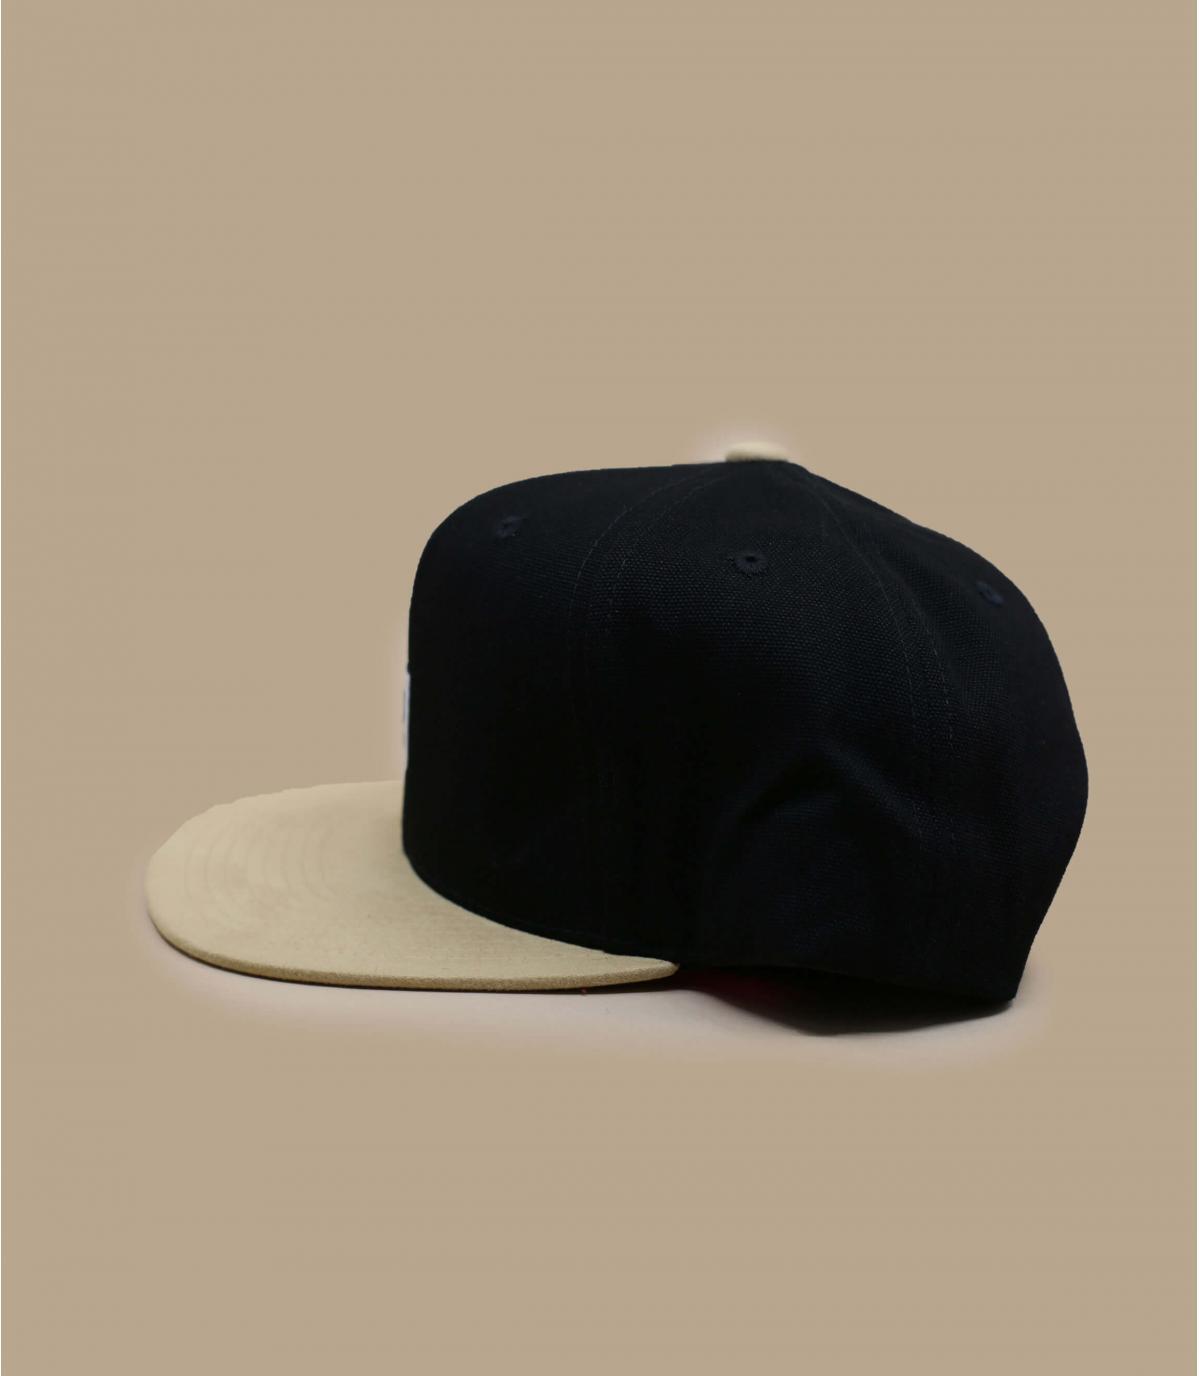 Details Alton Snapback black tan suede - Abbildung 2